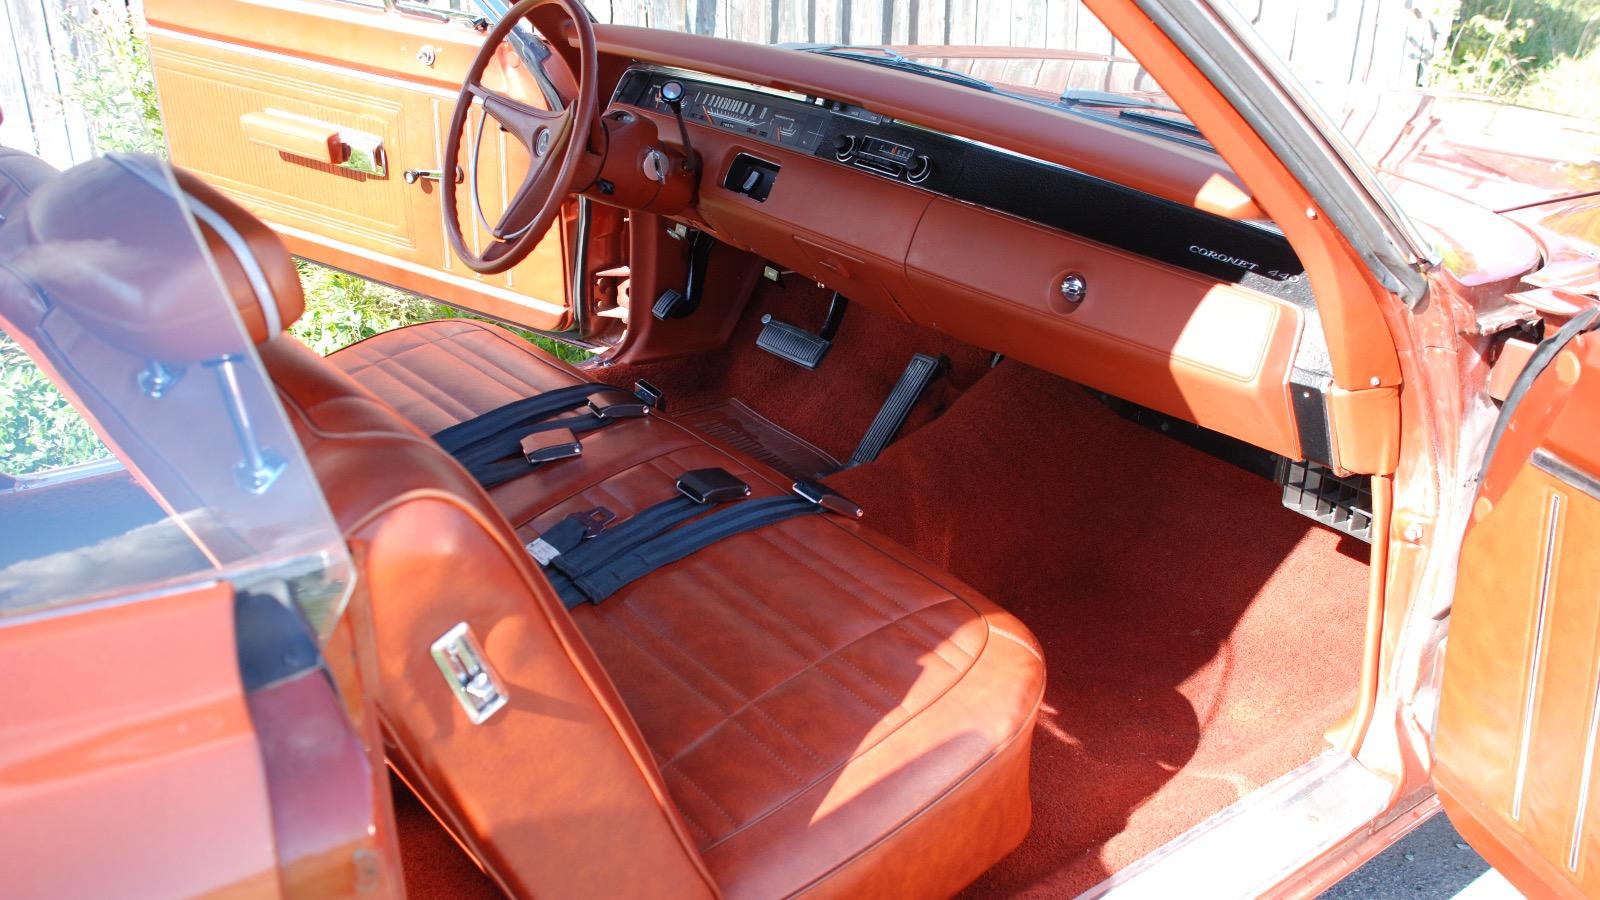 Helhetsinntrykket av bilen forsterkes med det brun-oransje interiøret.